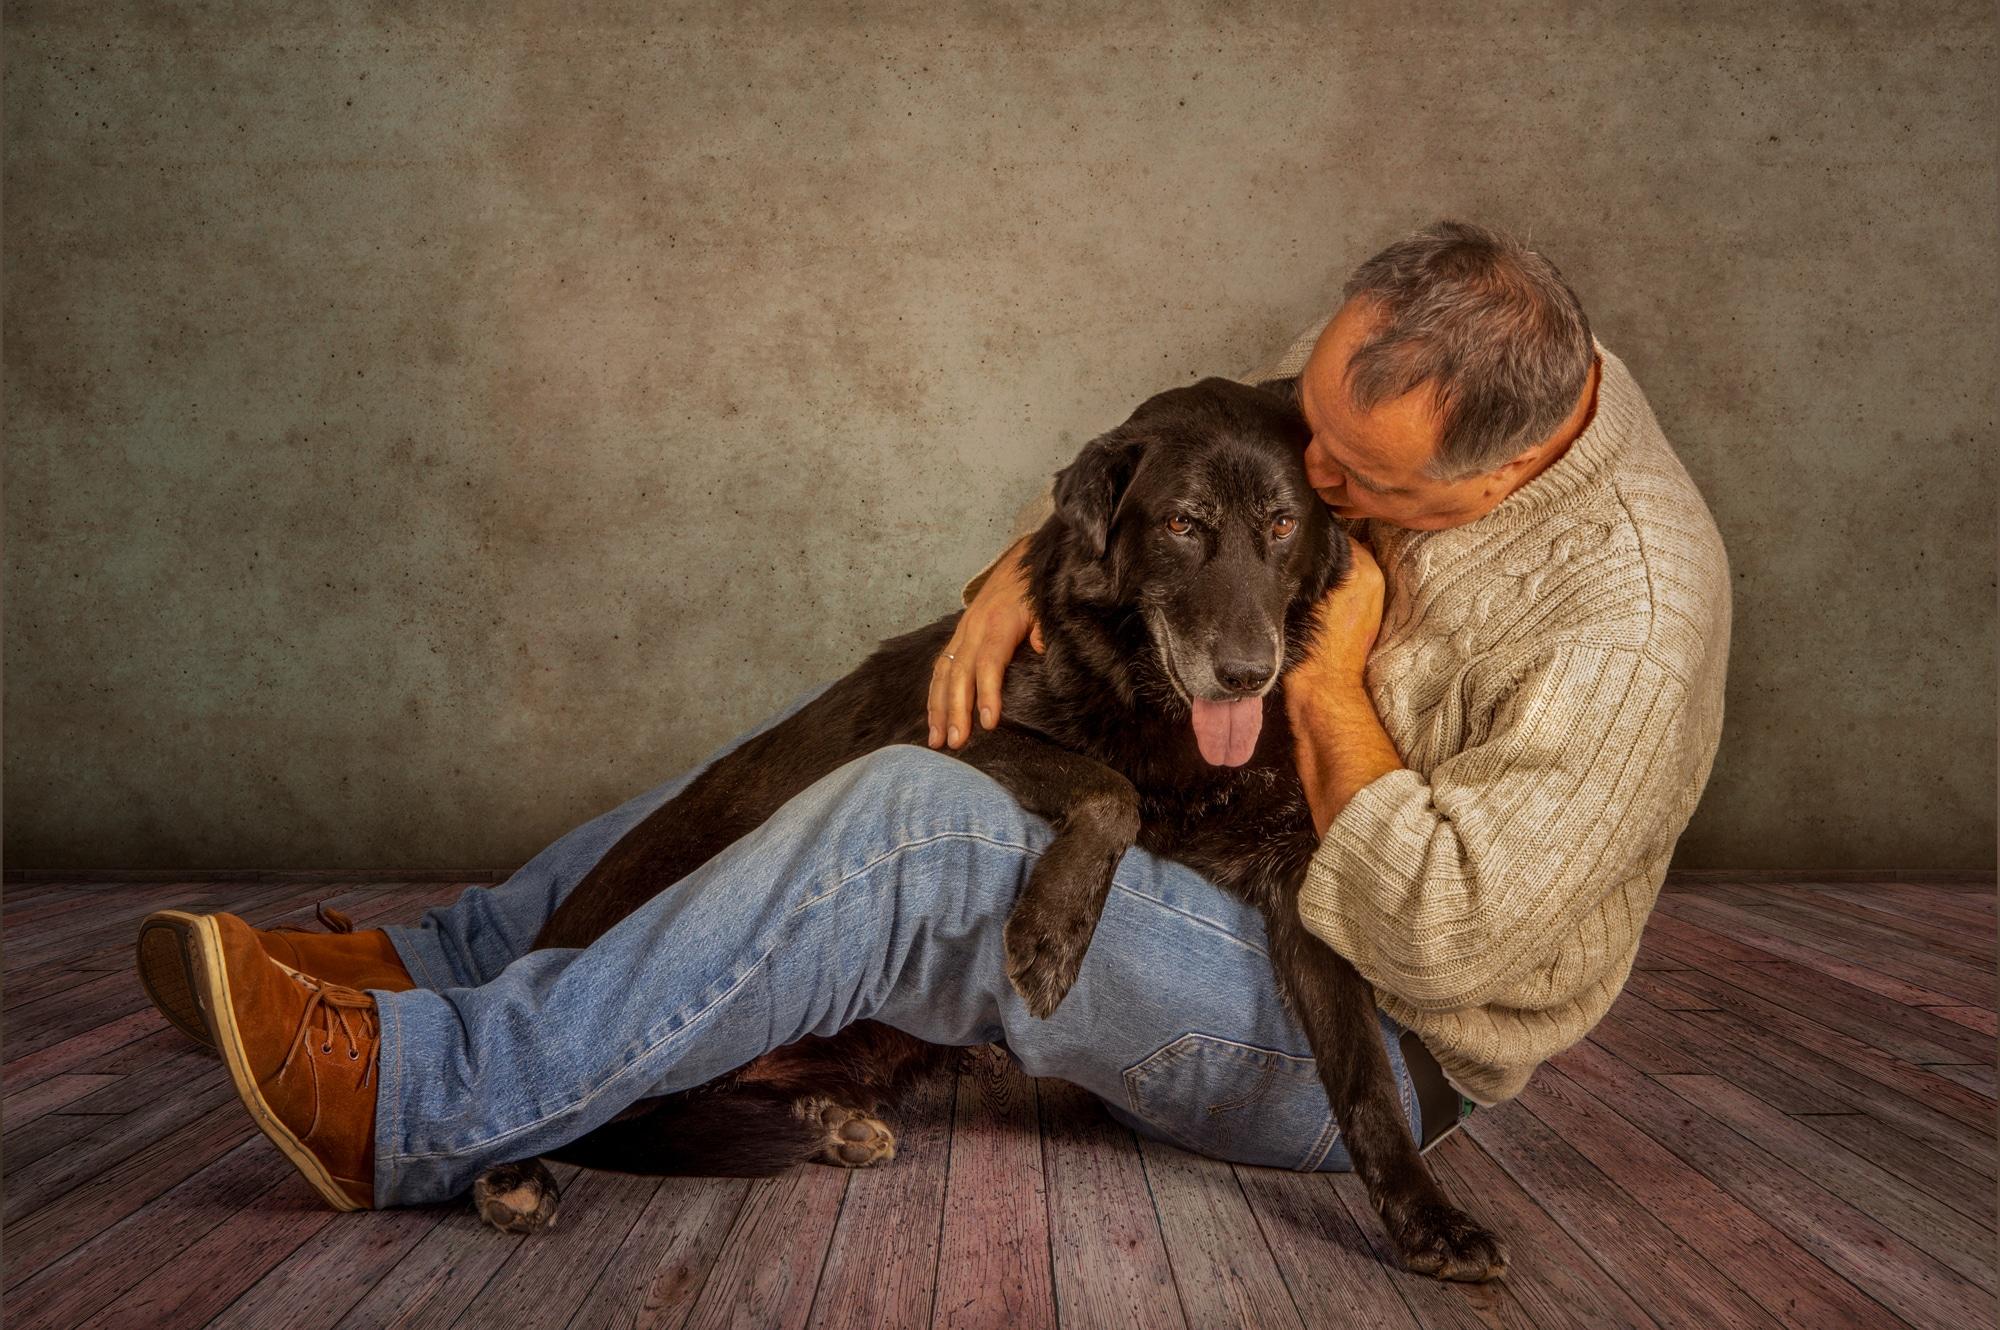 Mann Hund Fotoshooting